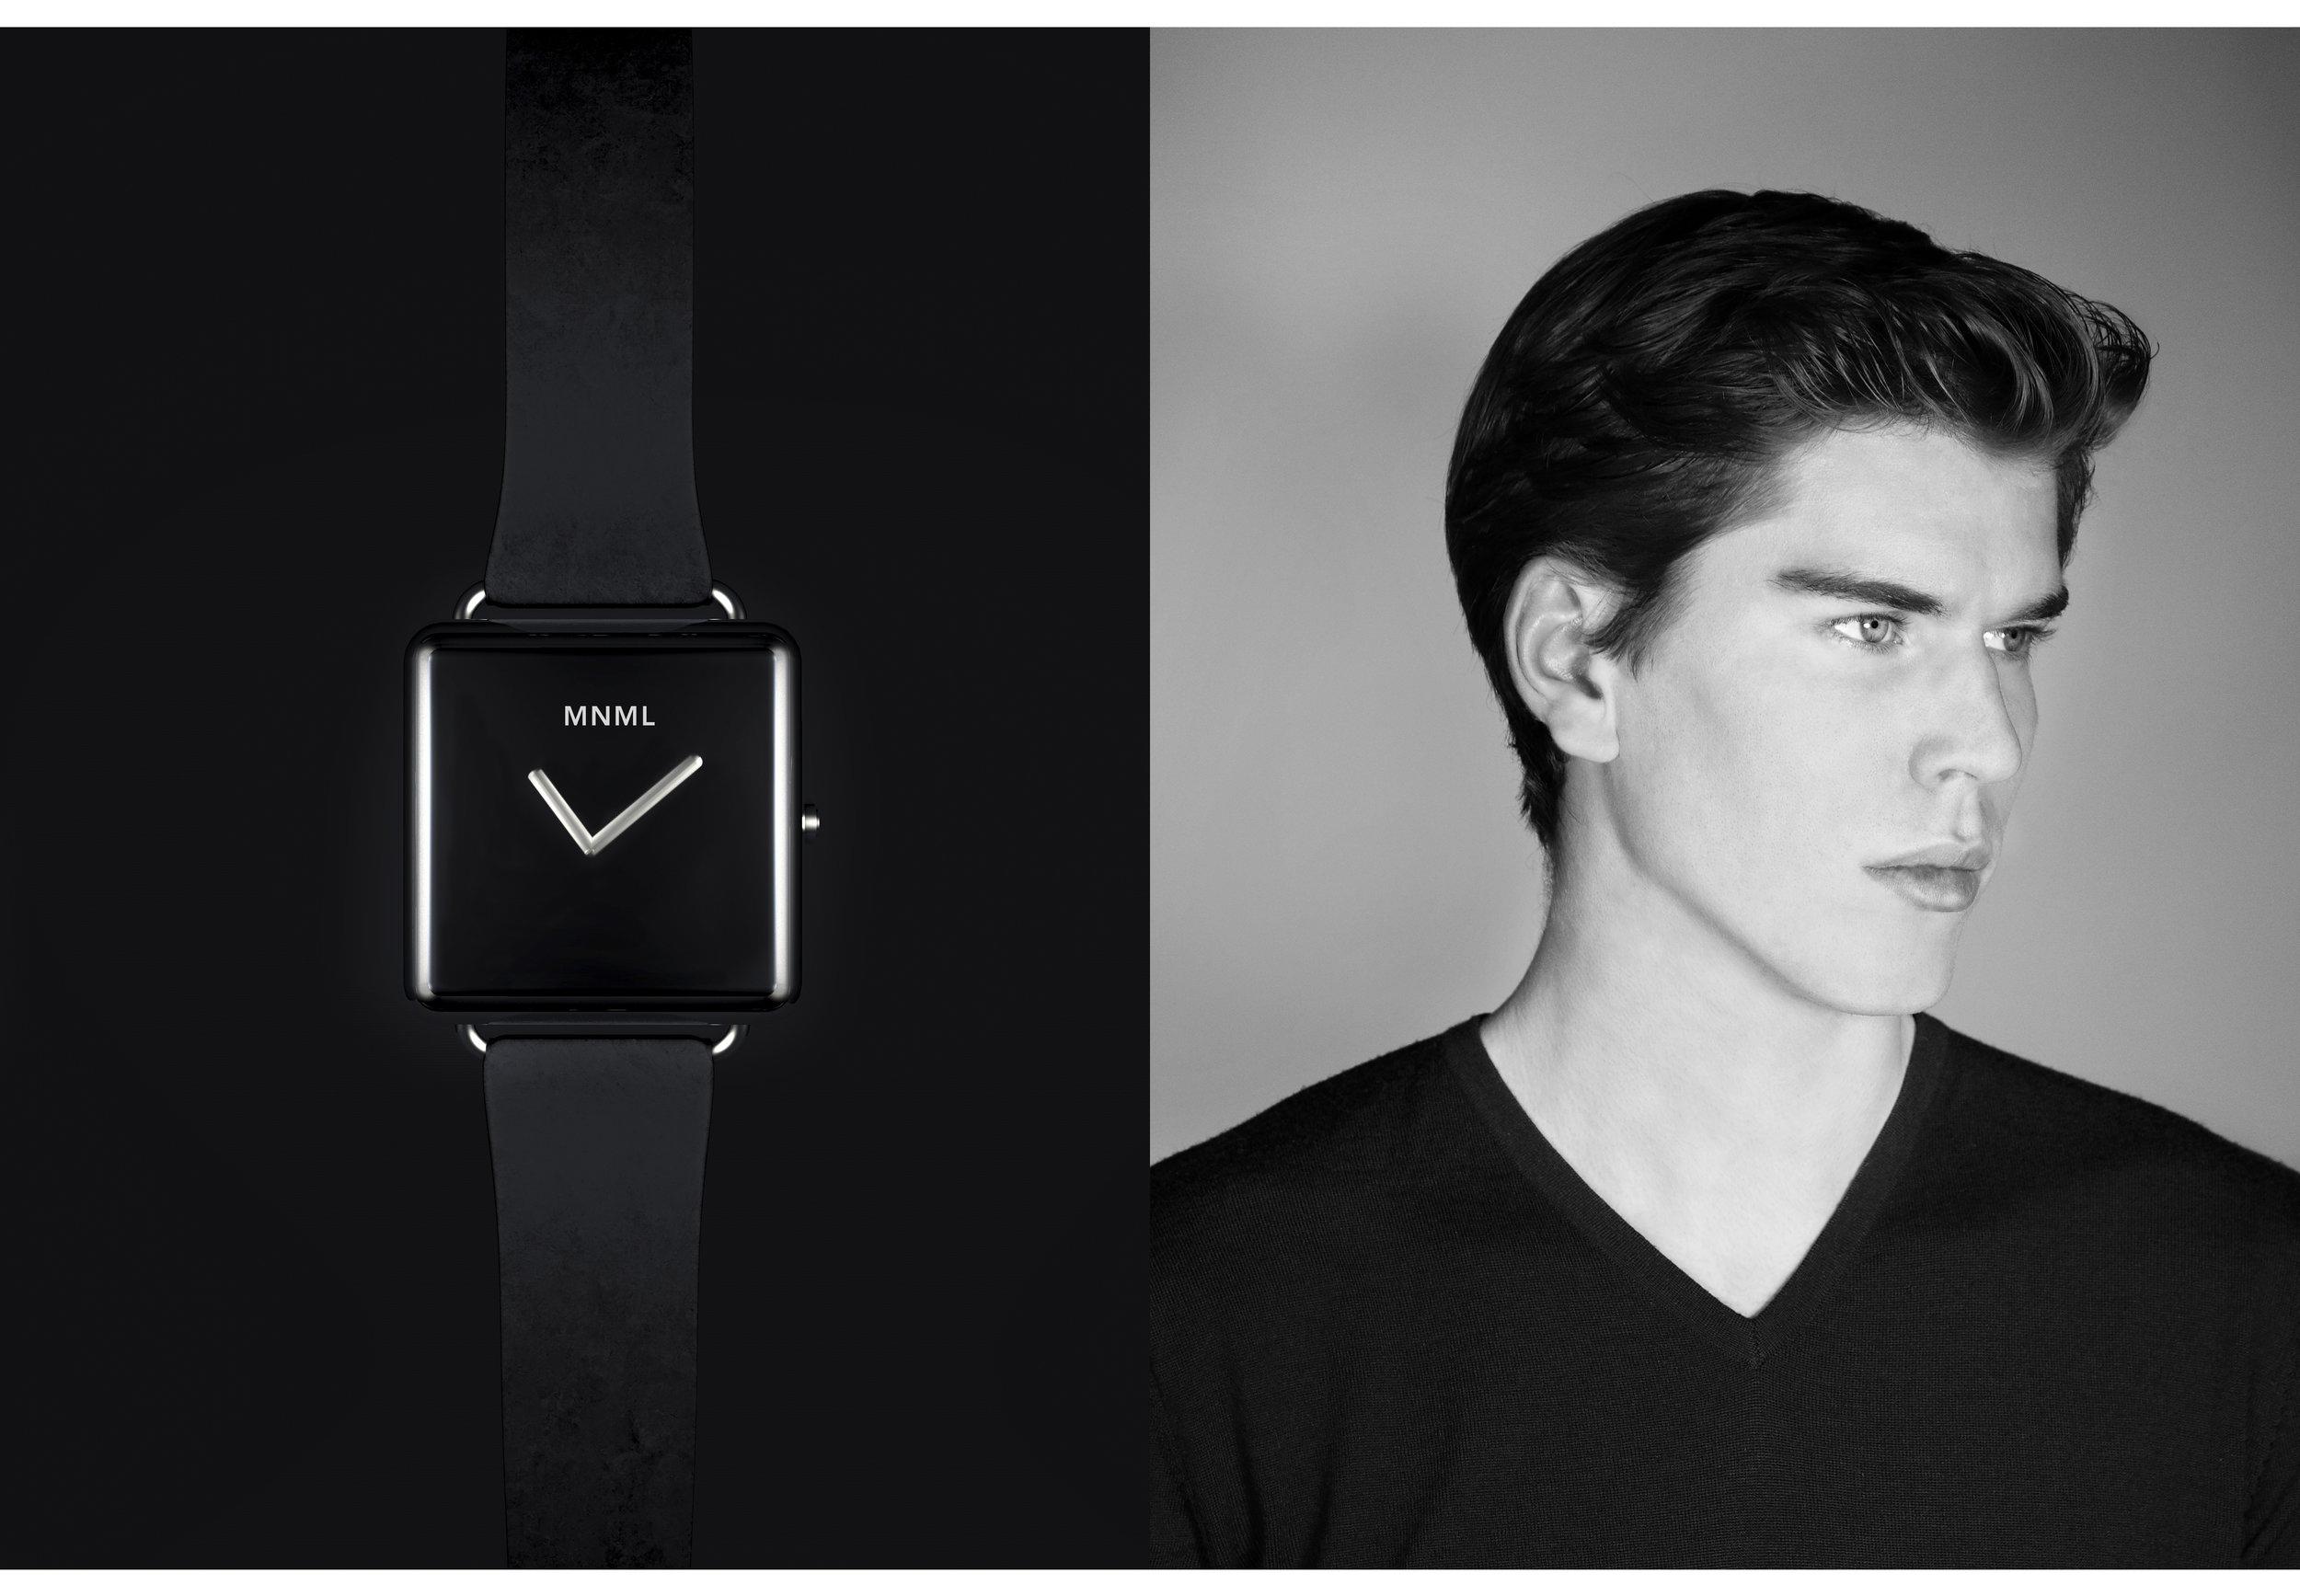 3D Model Watch + Ad